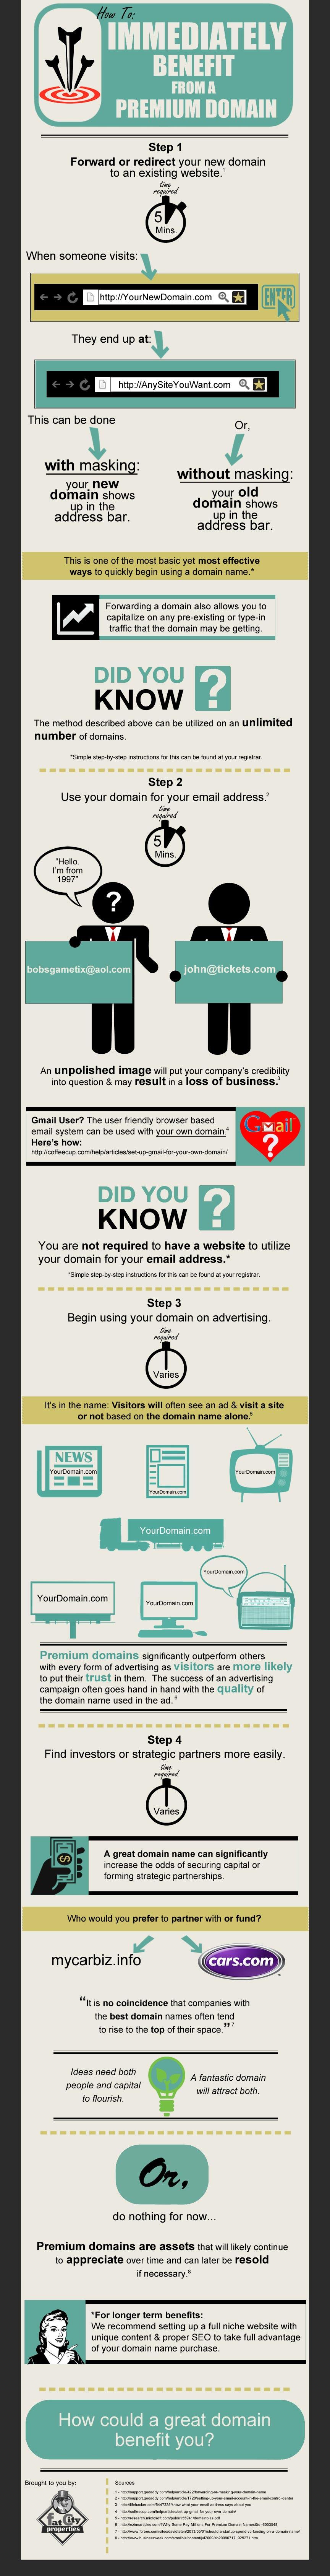 infographic-premium-domain-benefits